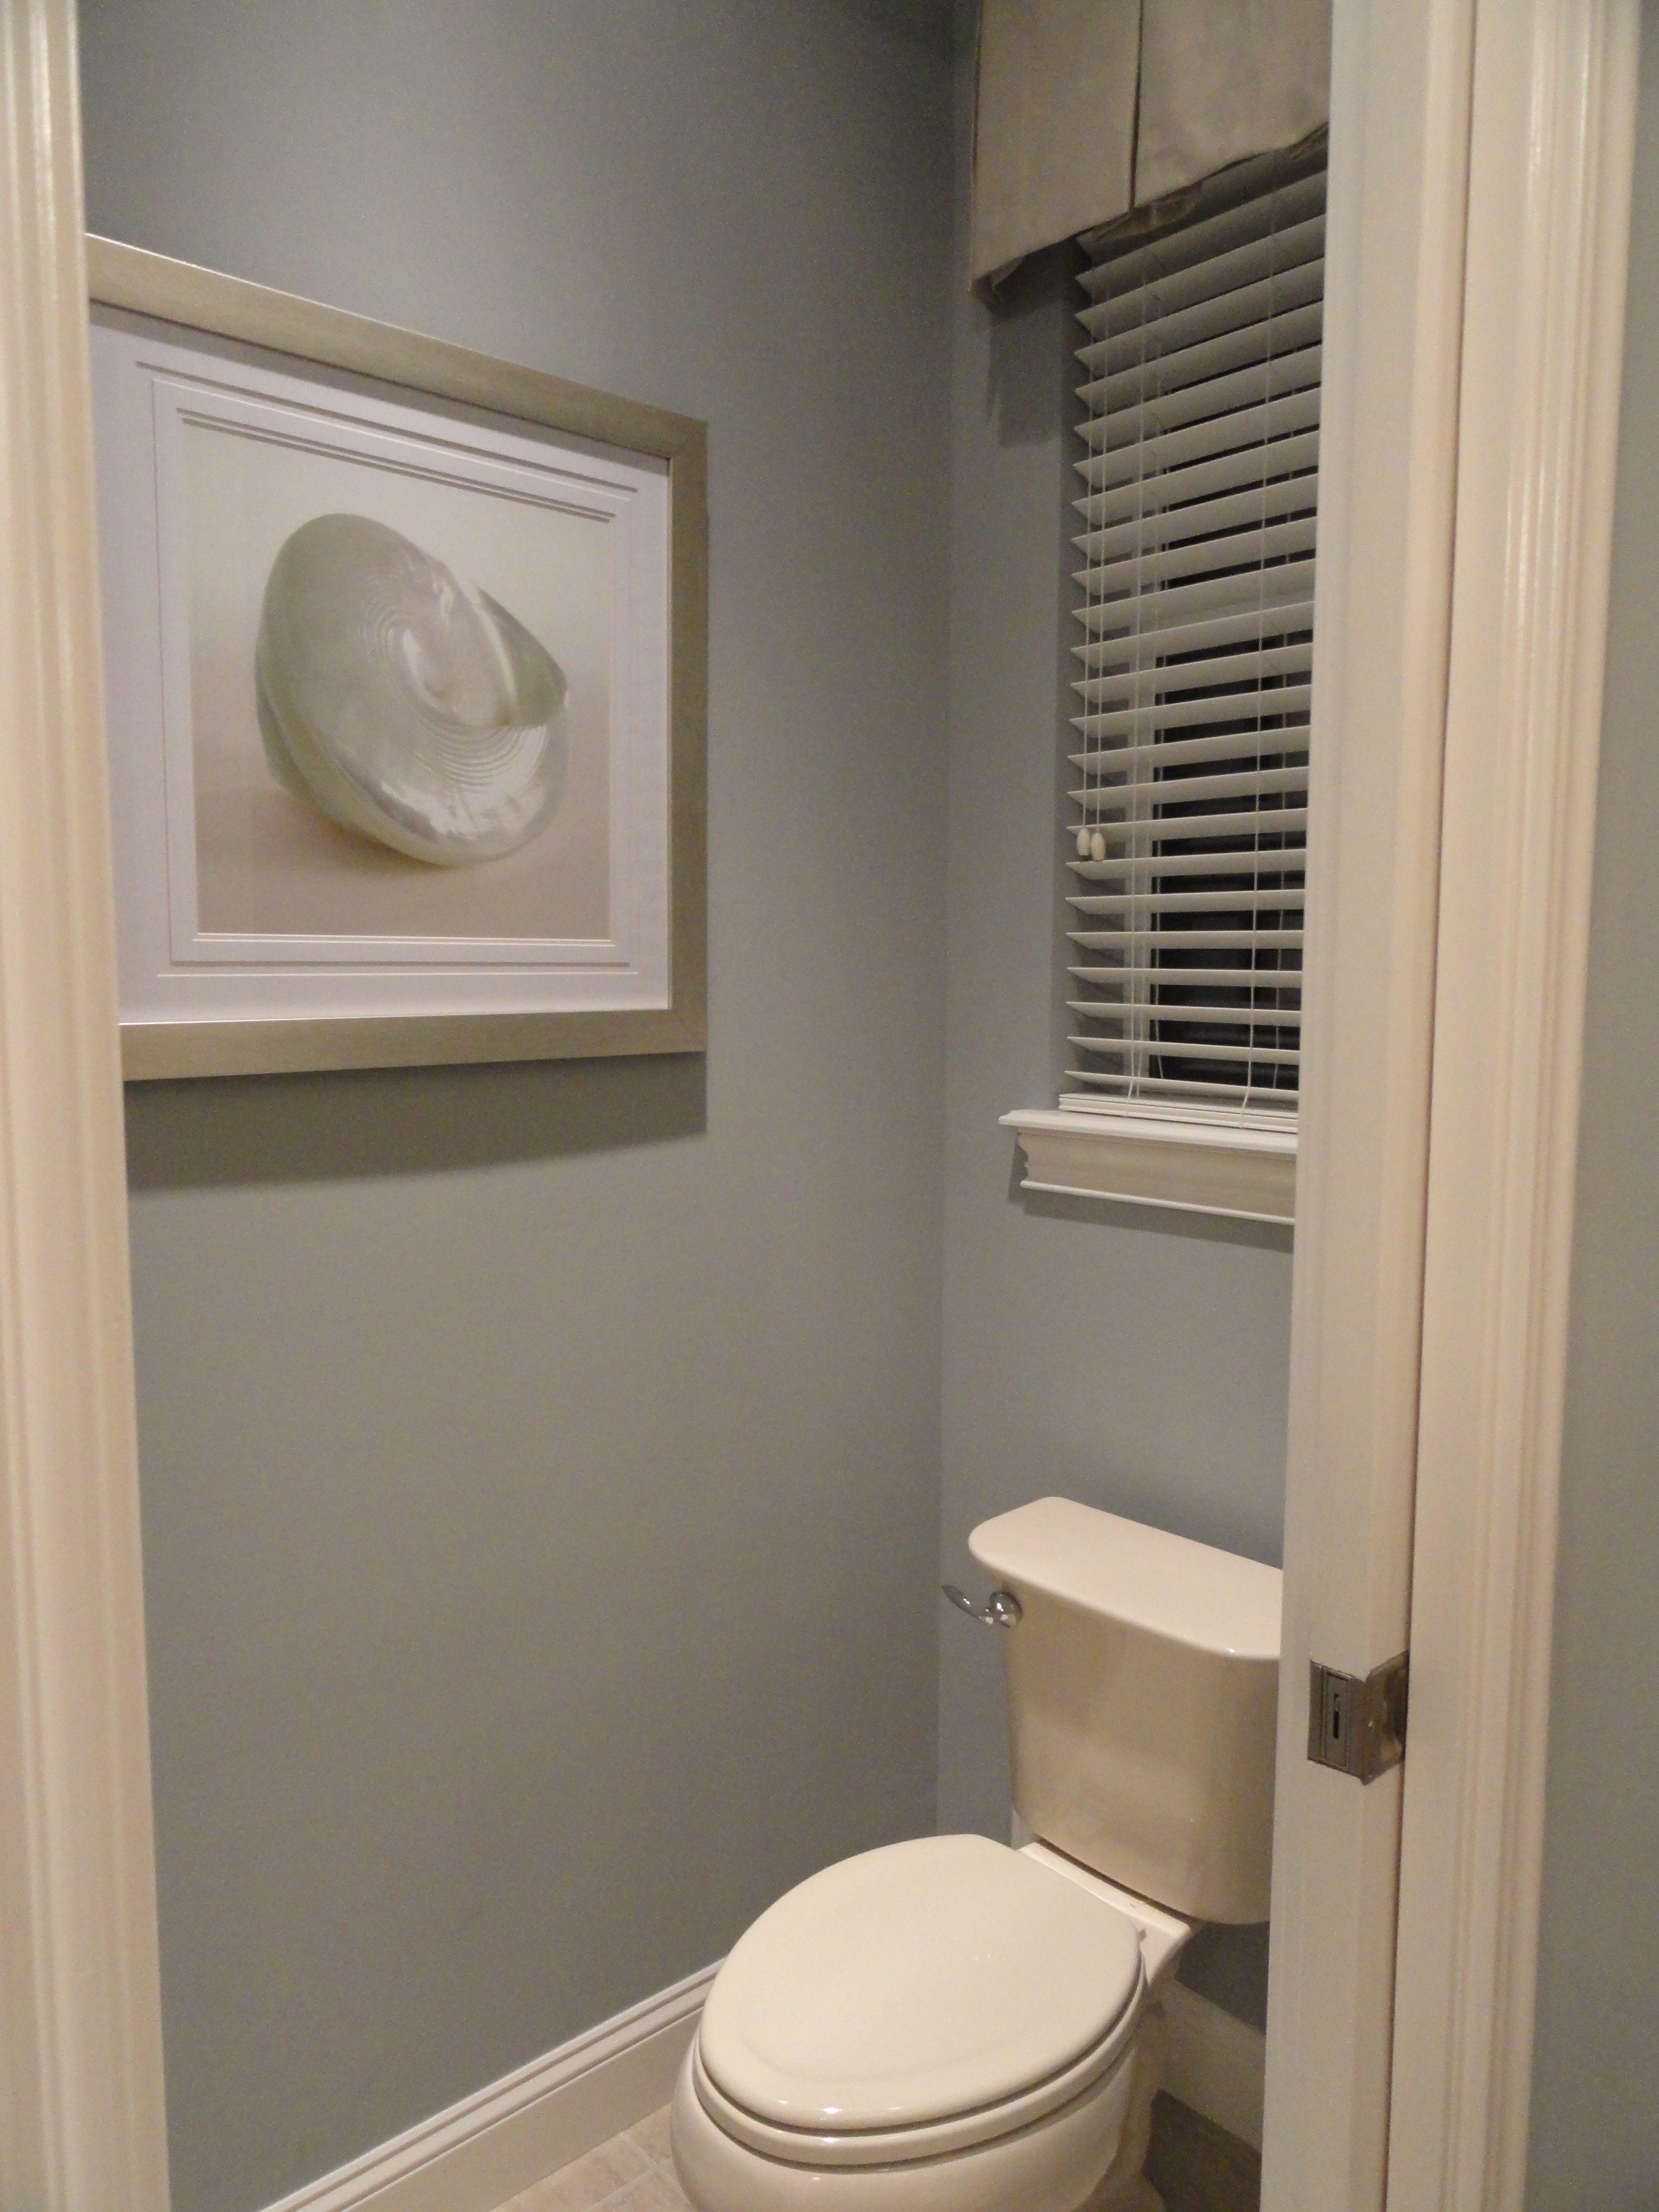 Master Water Closet I Need To Put A Small Valance Over The Tiny